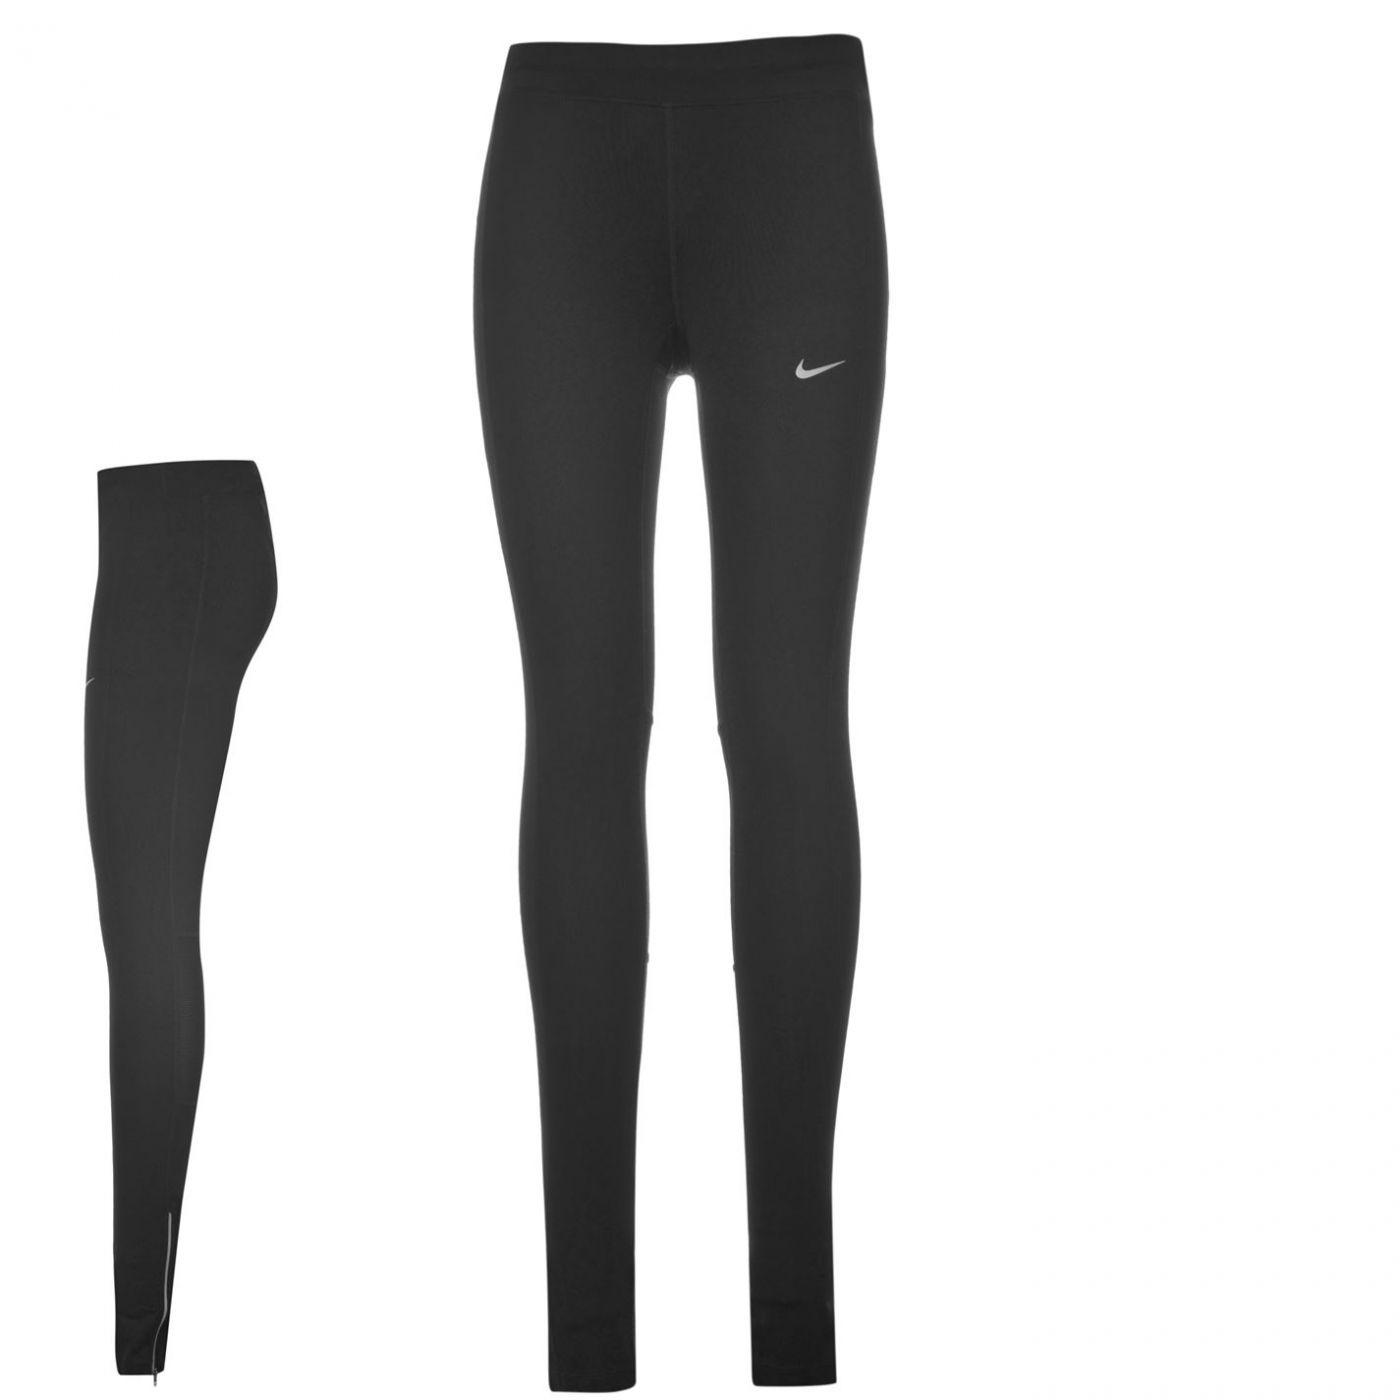 barato Contribuyente aterrizaje  Nike Essential Tights Ladies